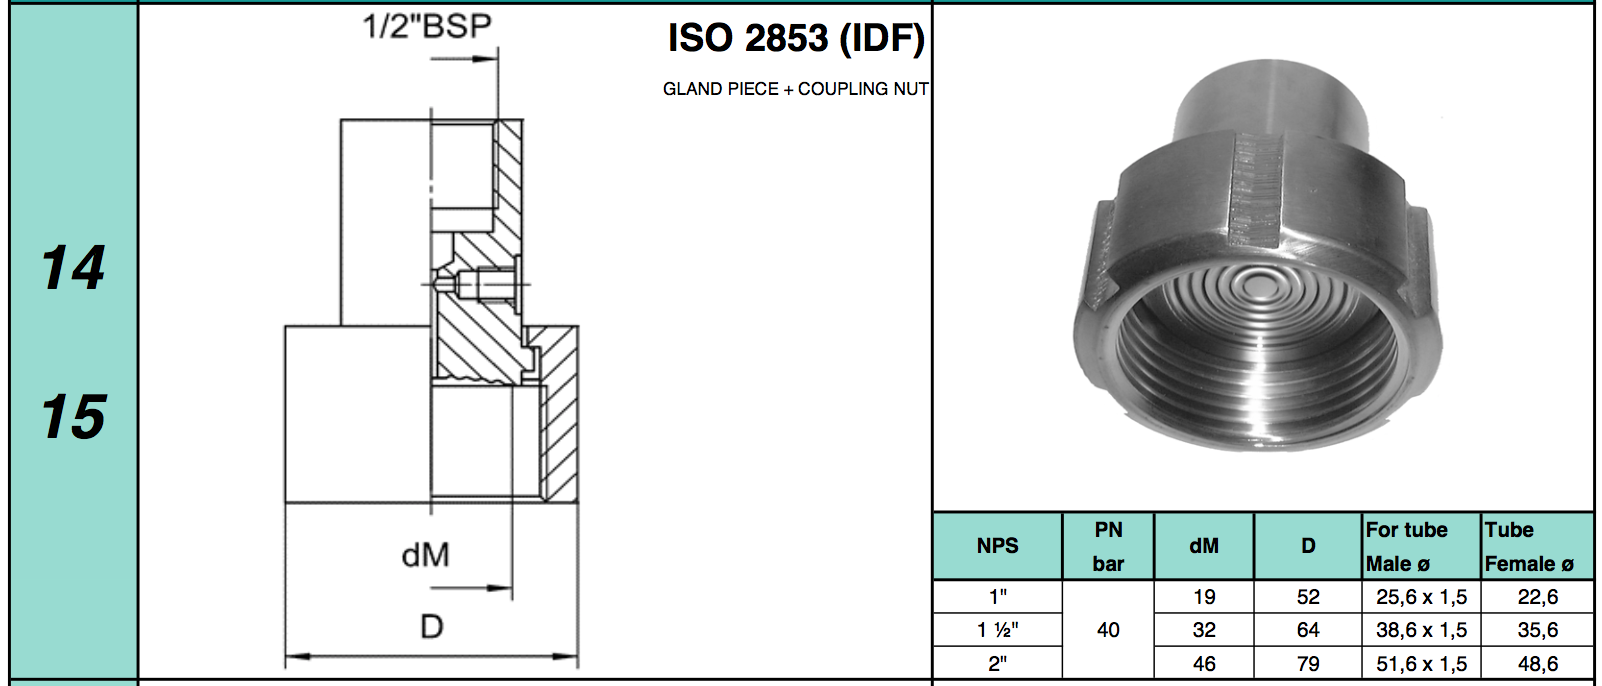 kết nối gland piece nut theo tiêu chuẩn ISO 2853 ( IDF )